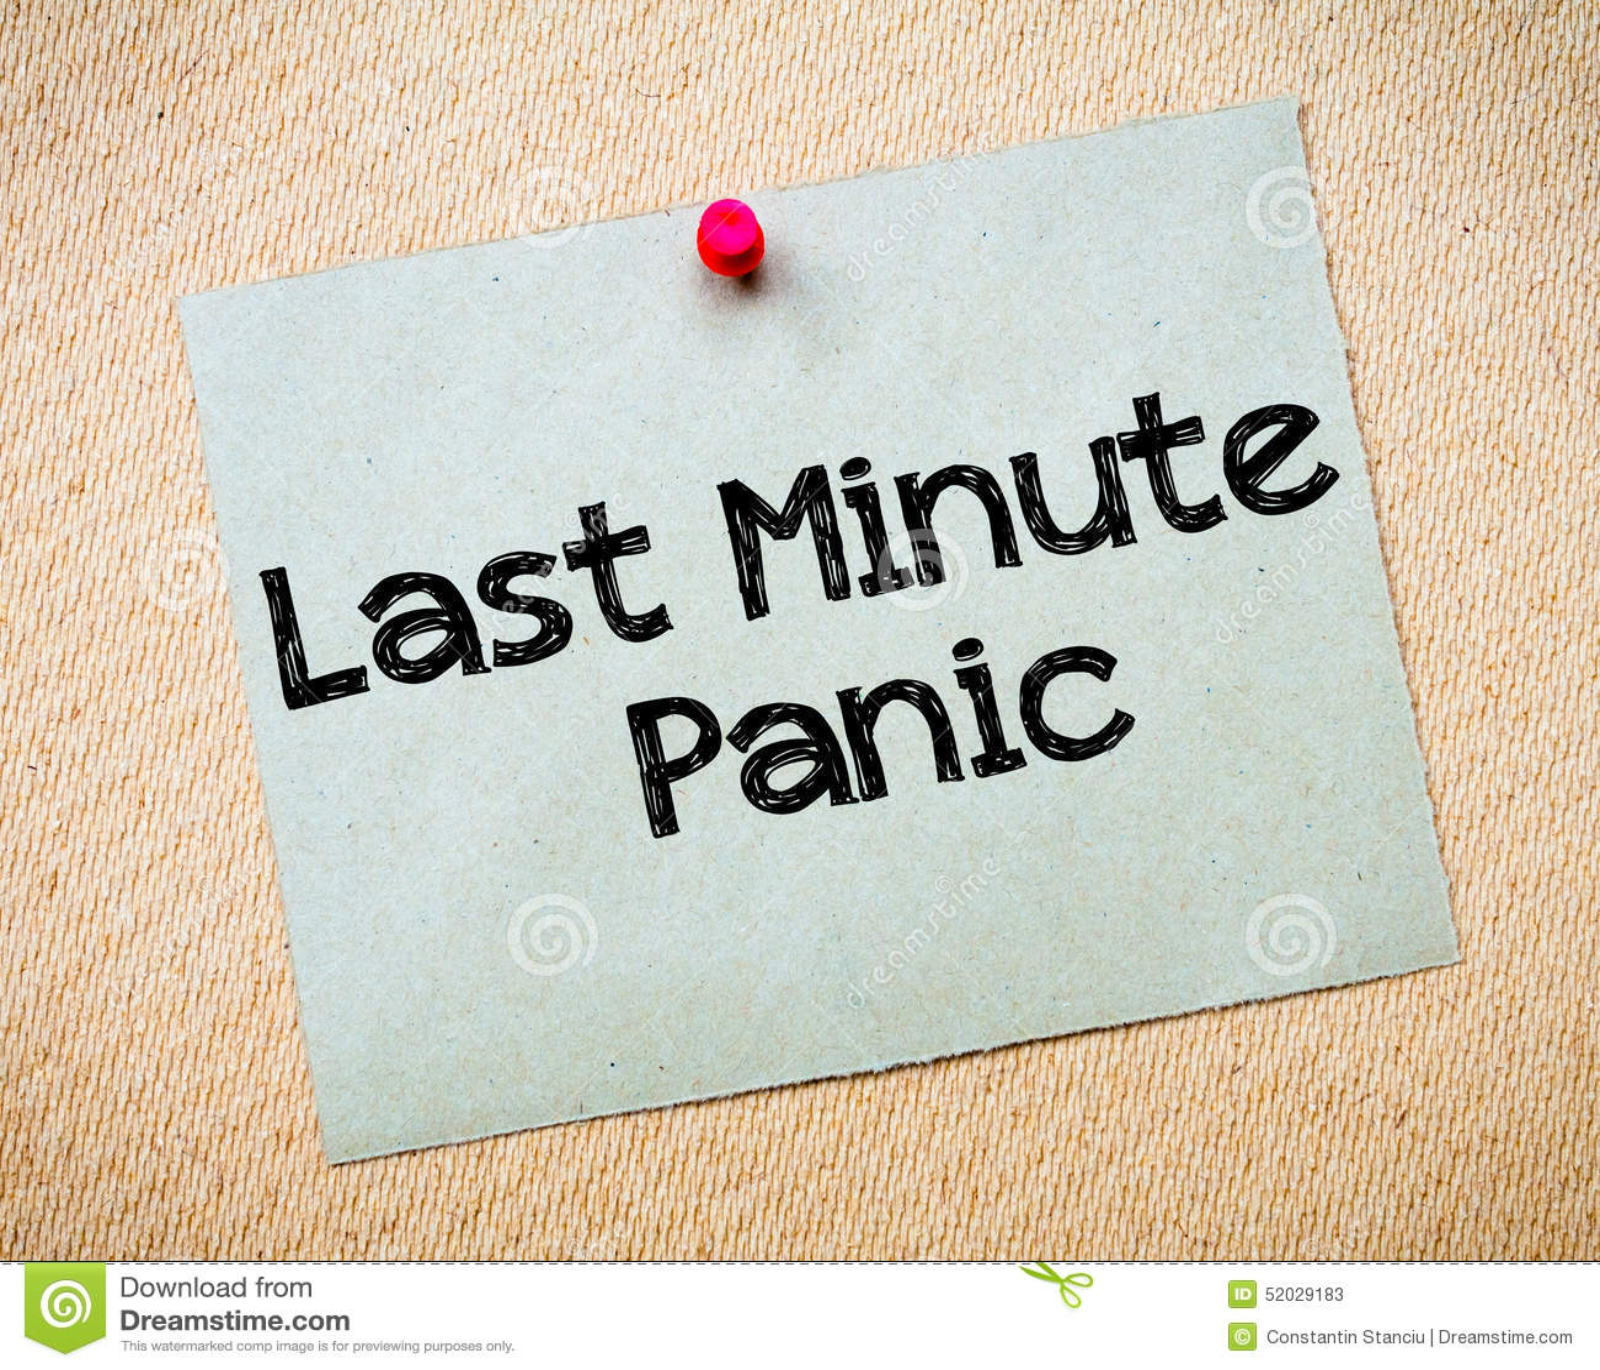 Last Minute Essay Panic Deepdownwellnesscom